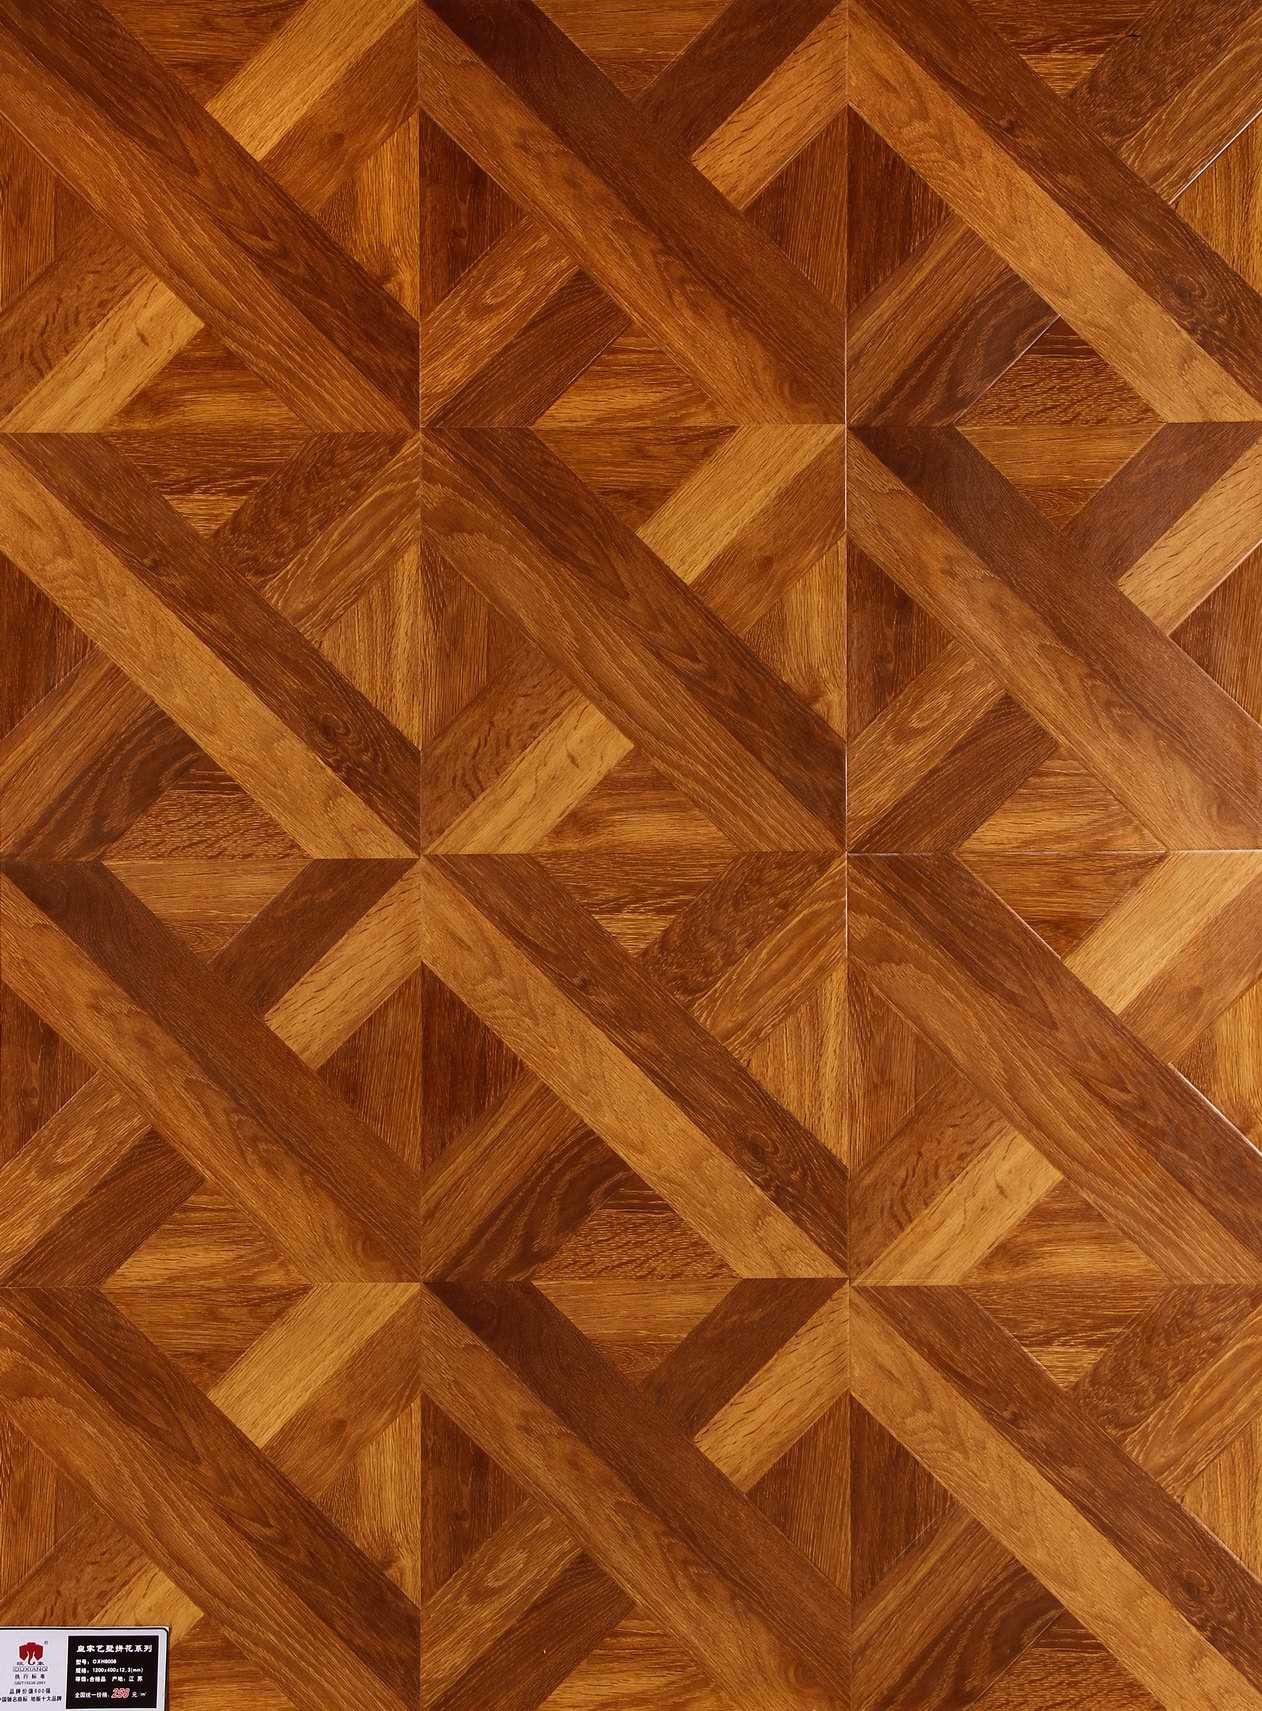 Parquet Flooring | Home Staging Furniture 2014